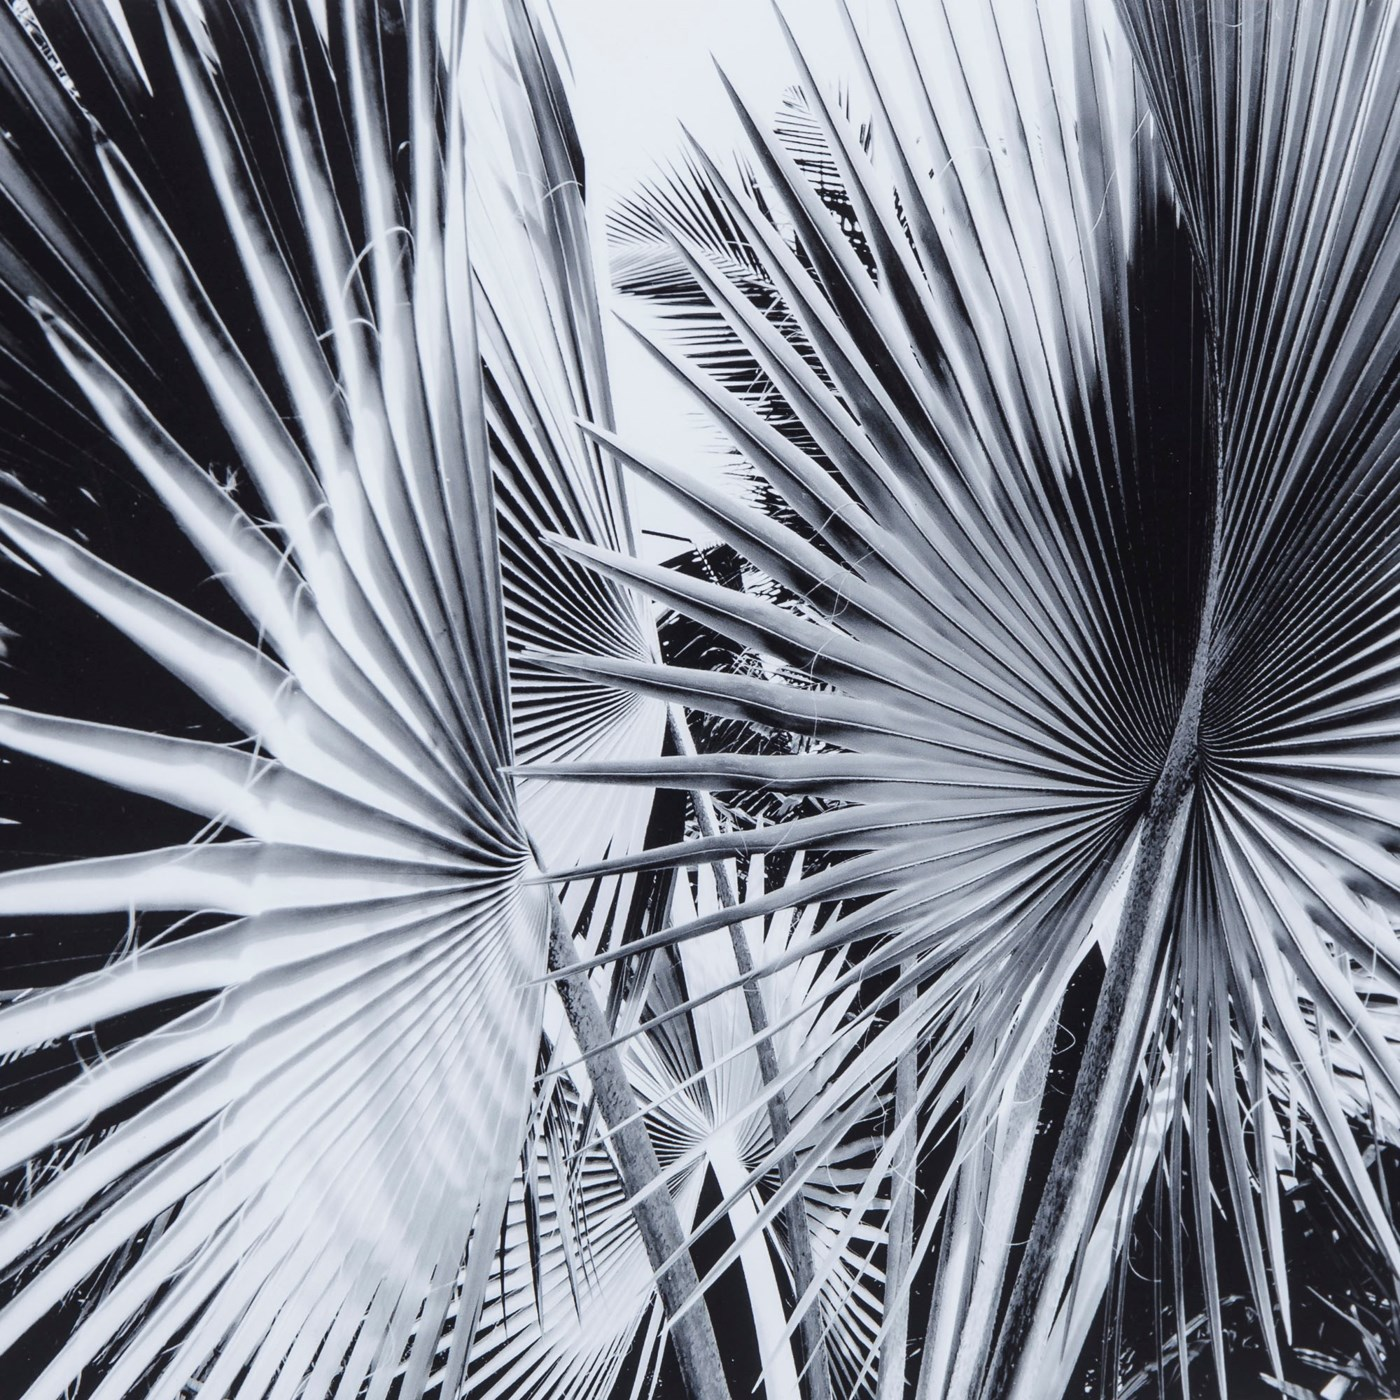 Black & White Palm Leaves - C